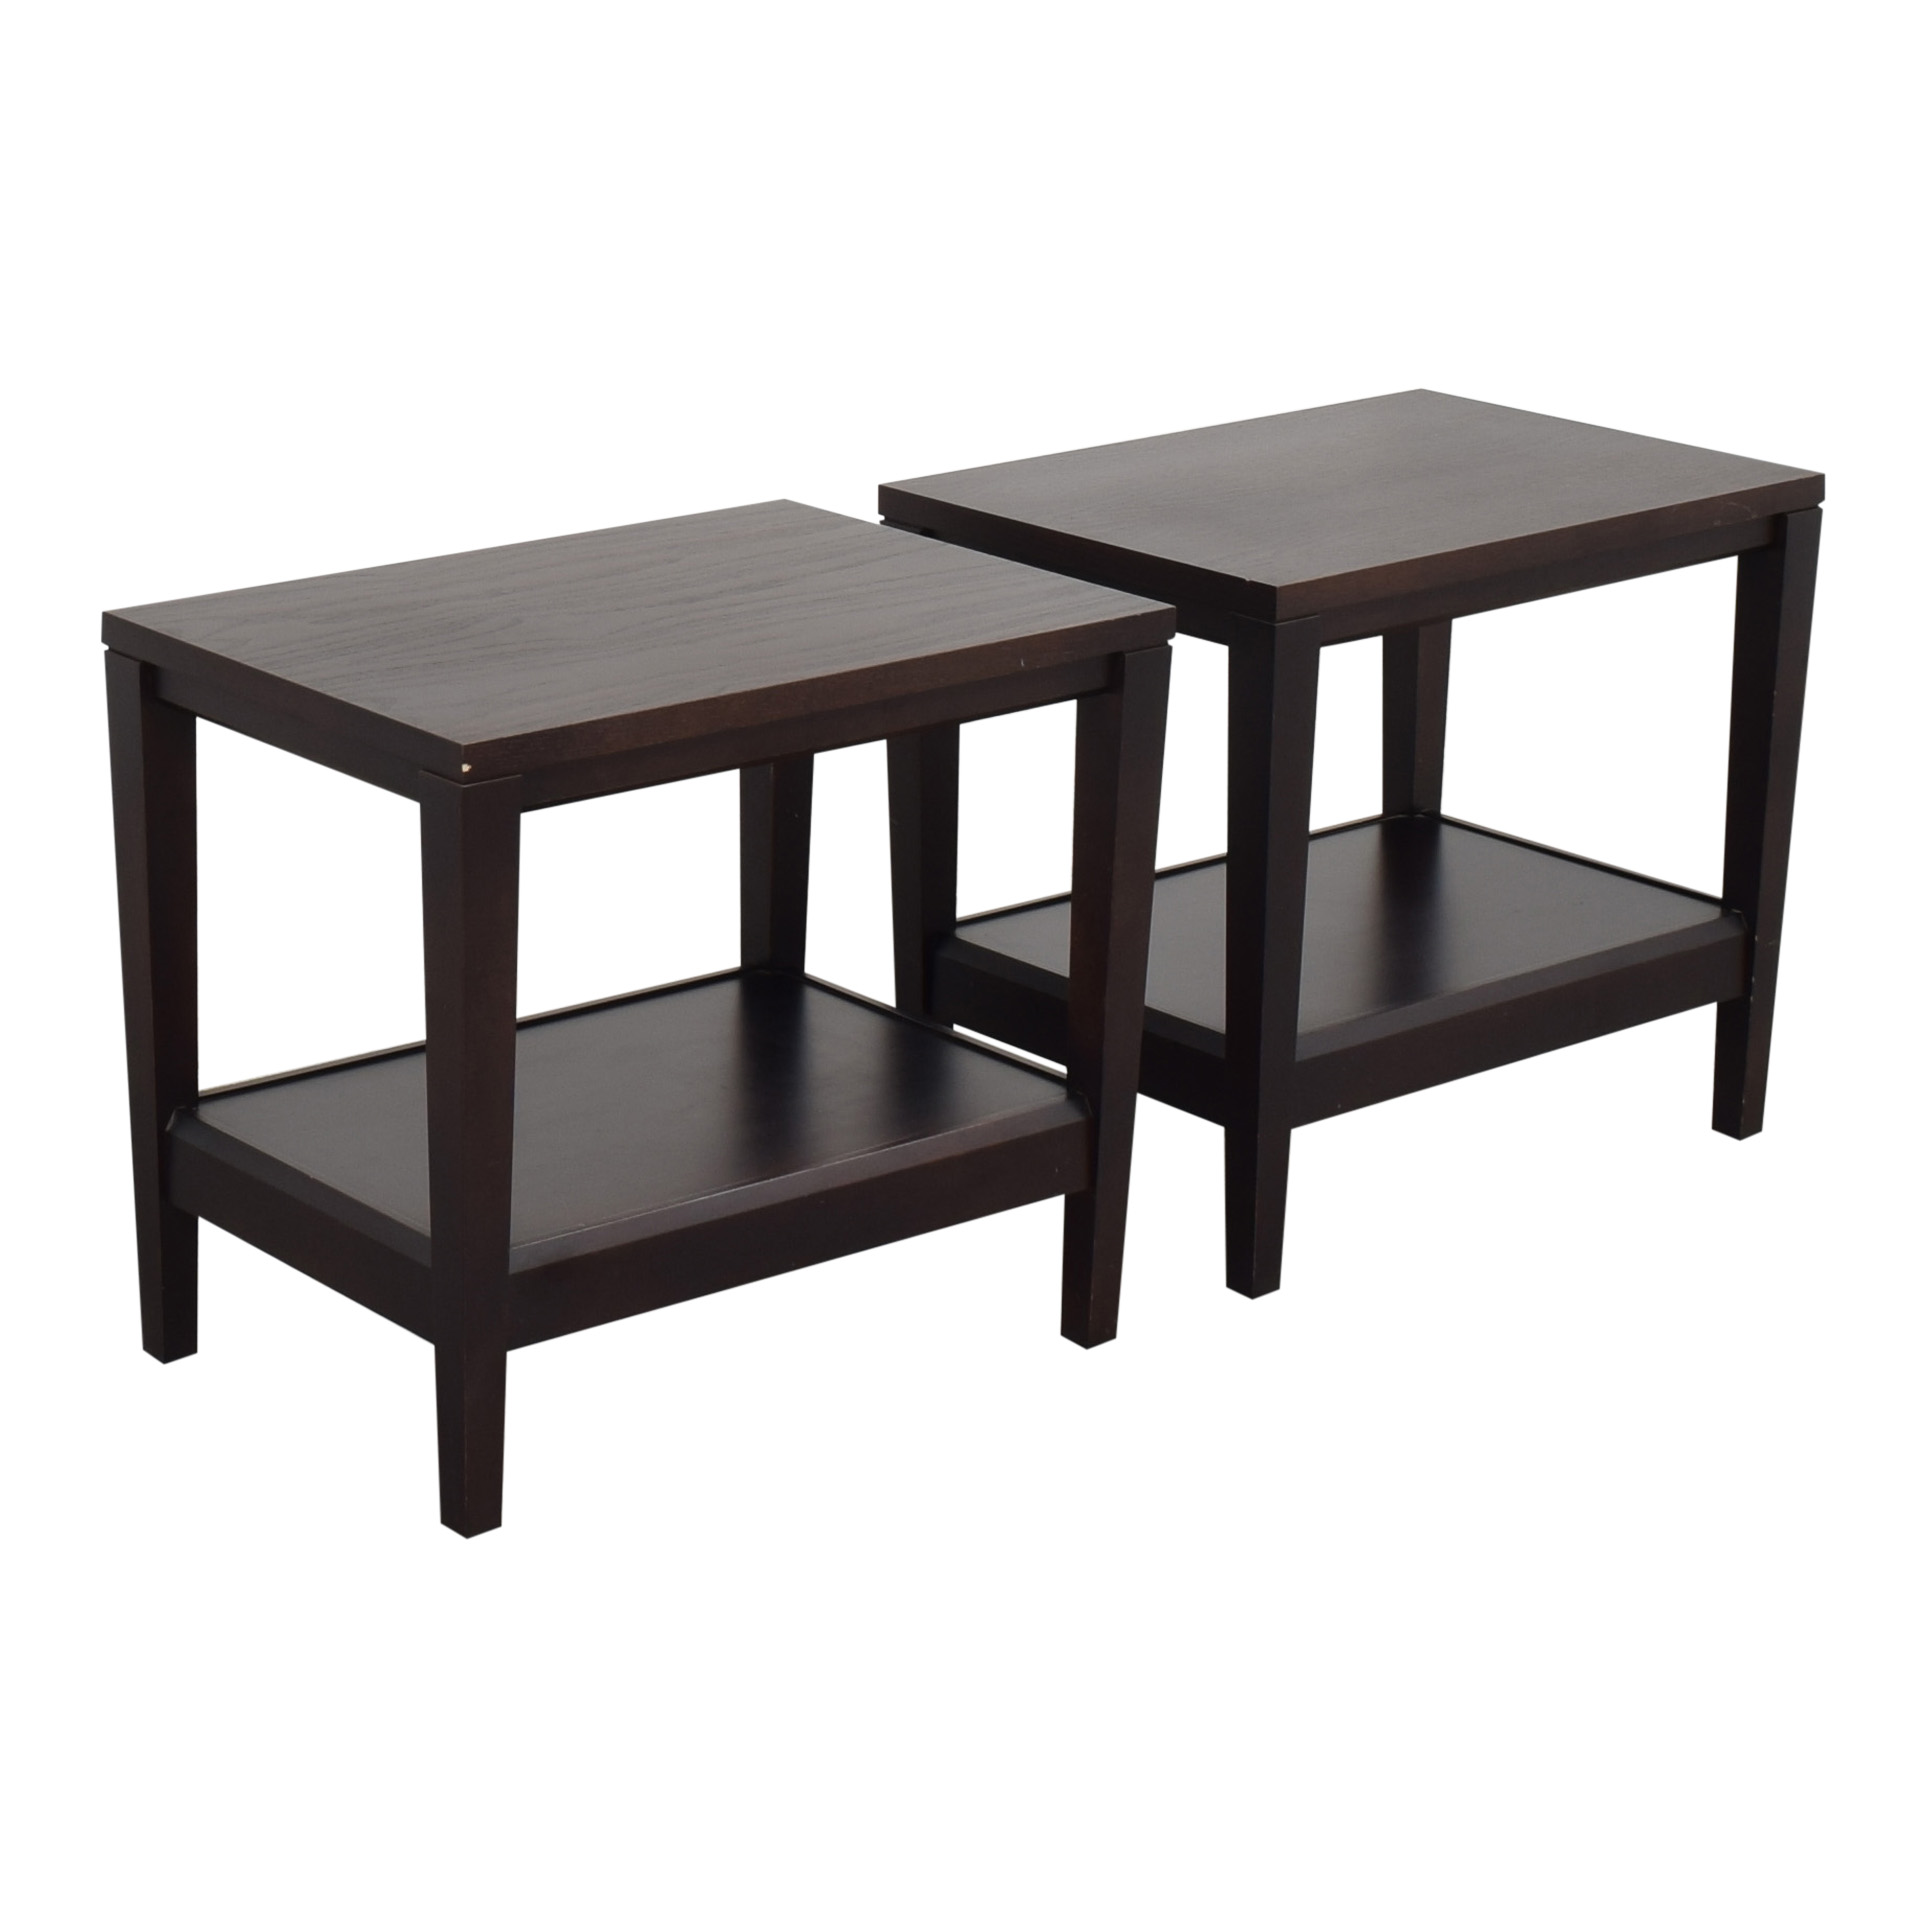 Baronet Crate & Barrel Baronet Side Tables dimensions